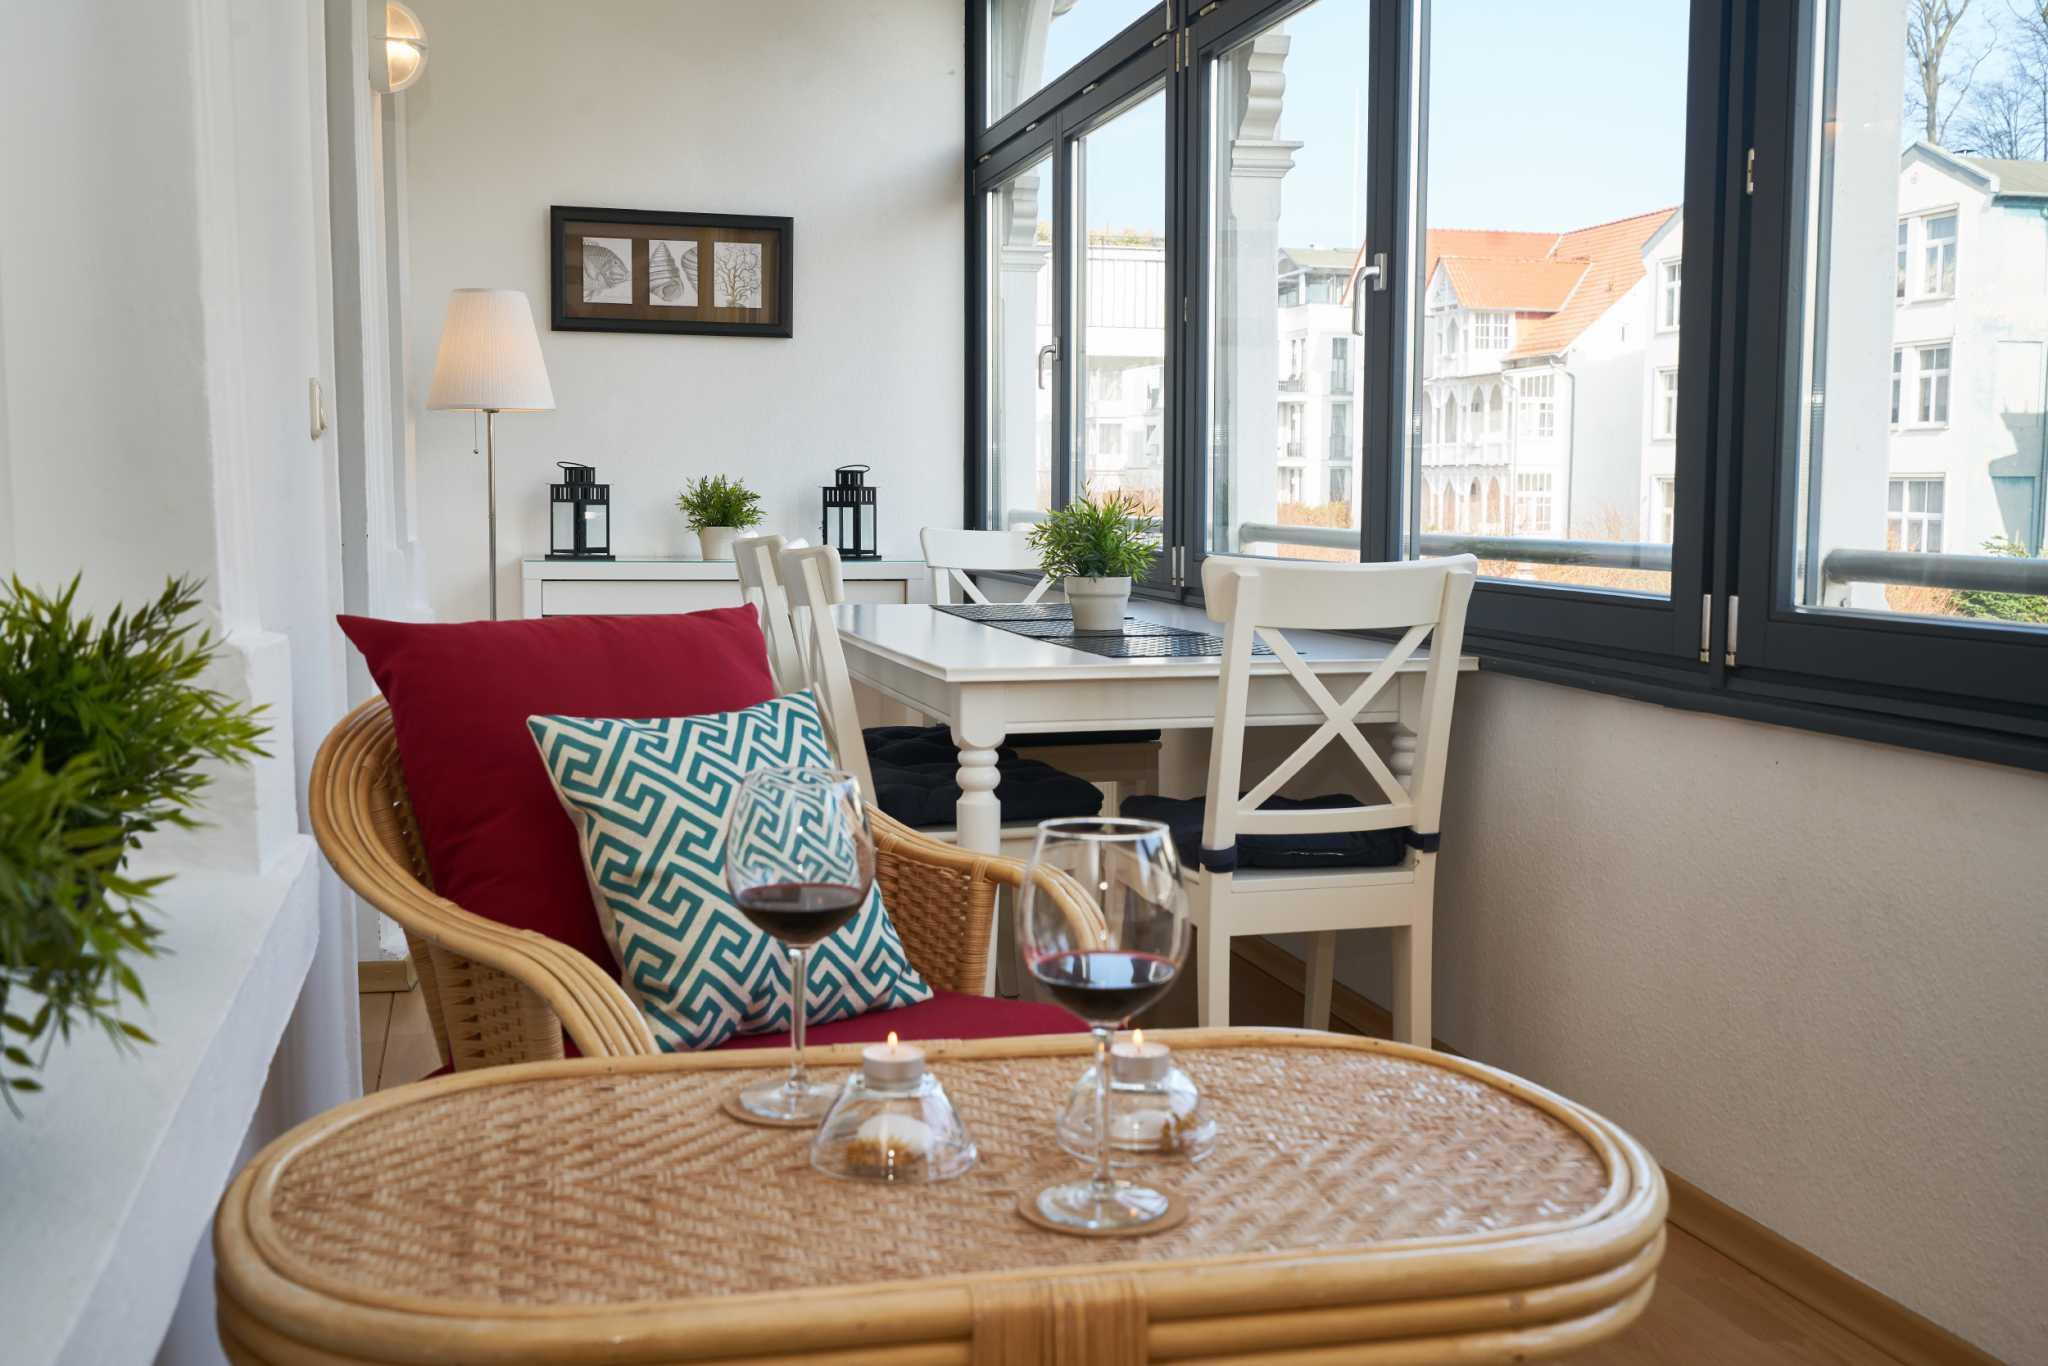 Haus am Meer, App. 5, großer, möbl. Wintergarten, strandnah